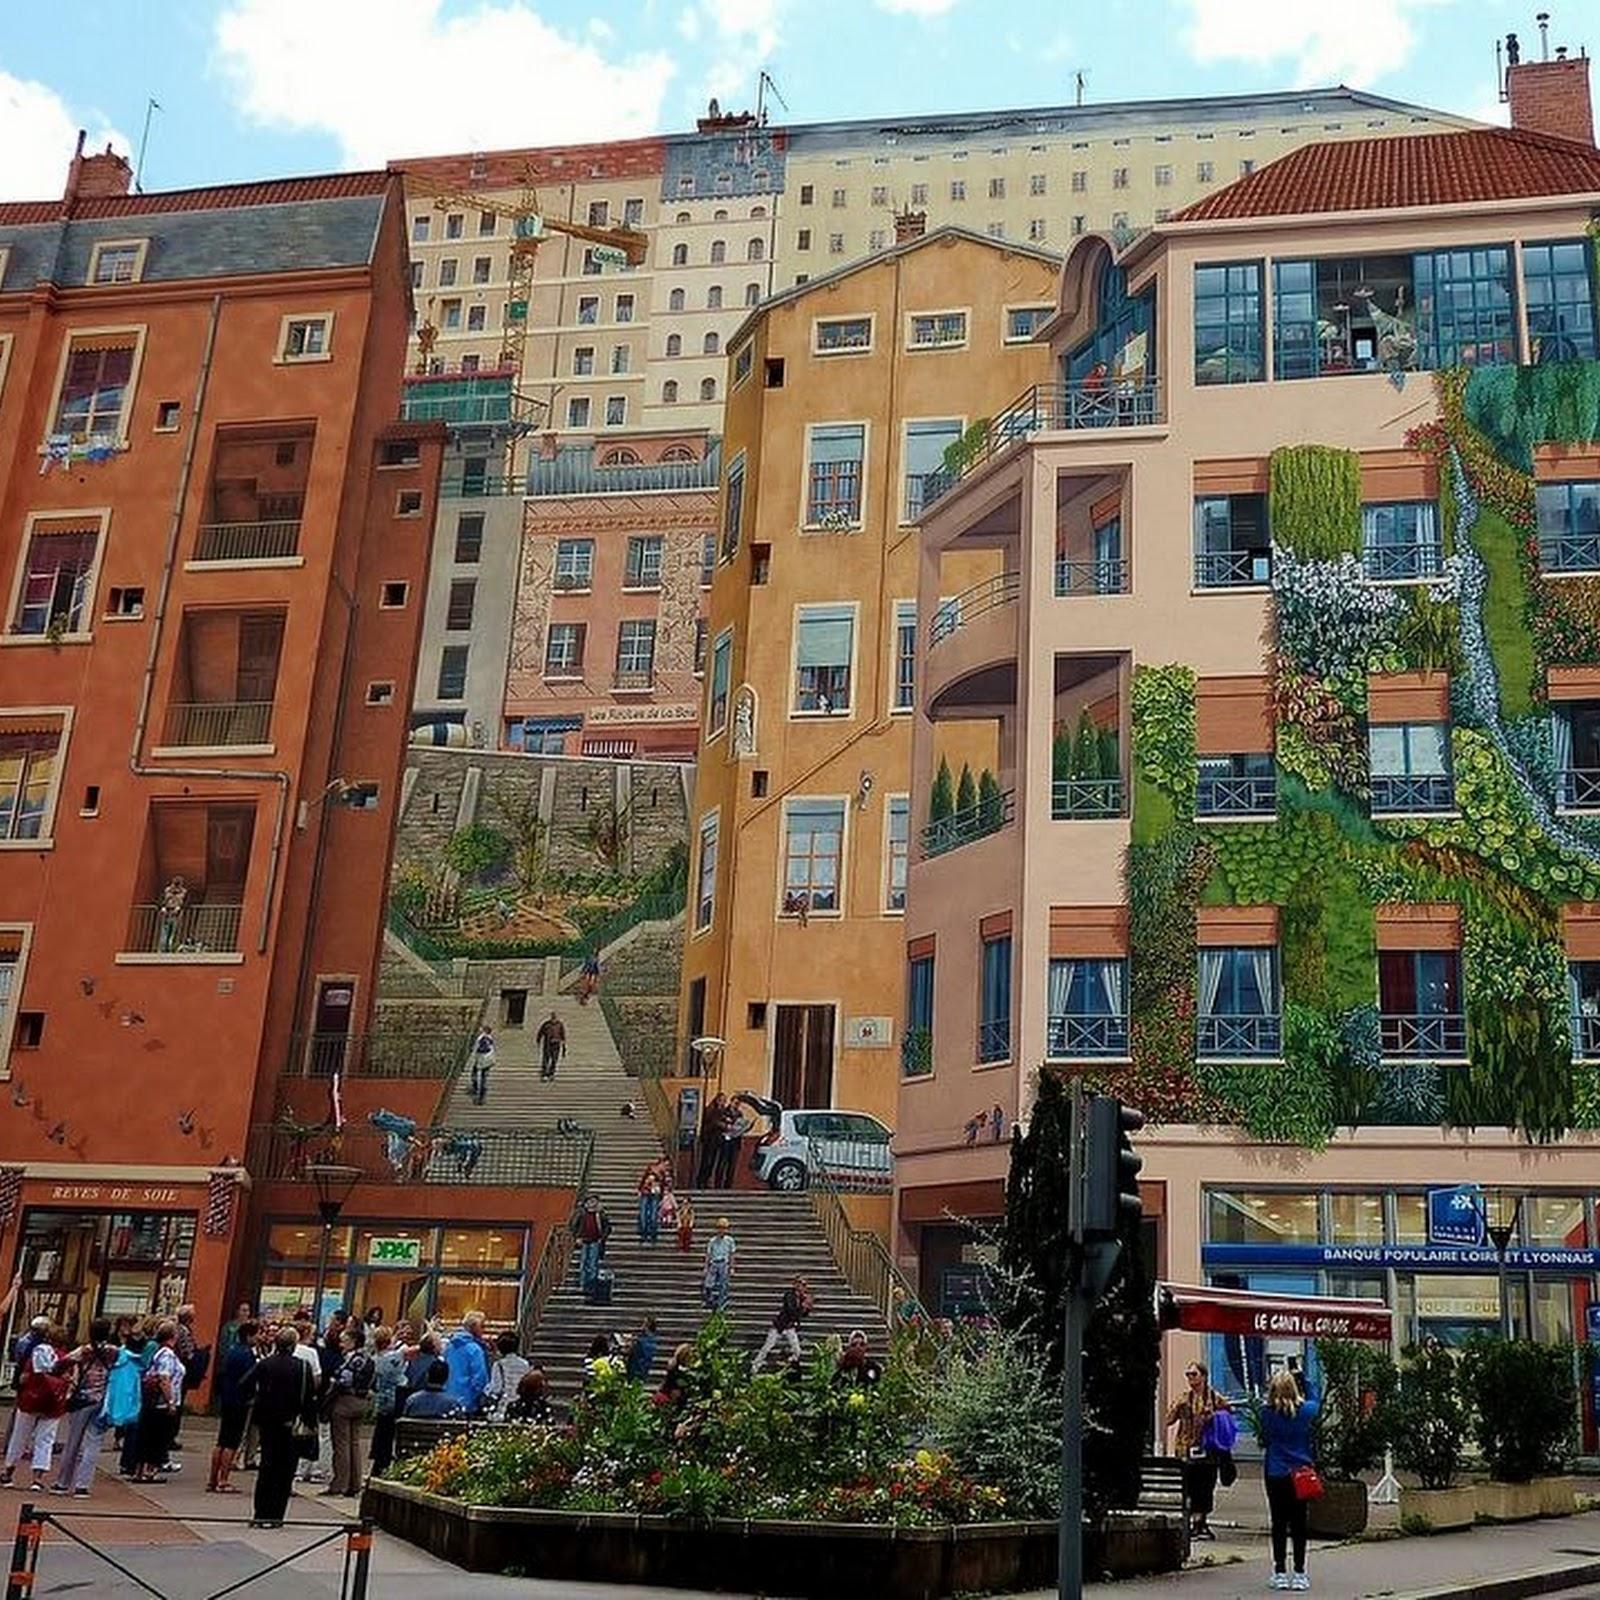 Lyon, The City of Murals